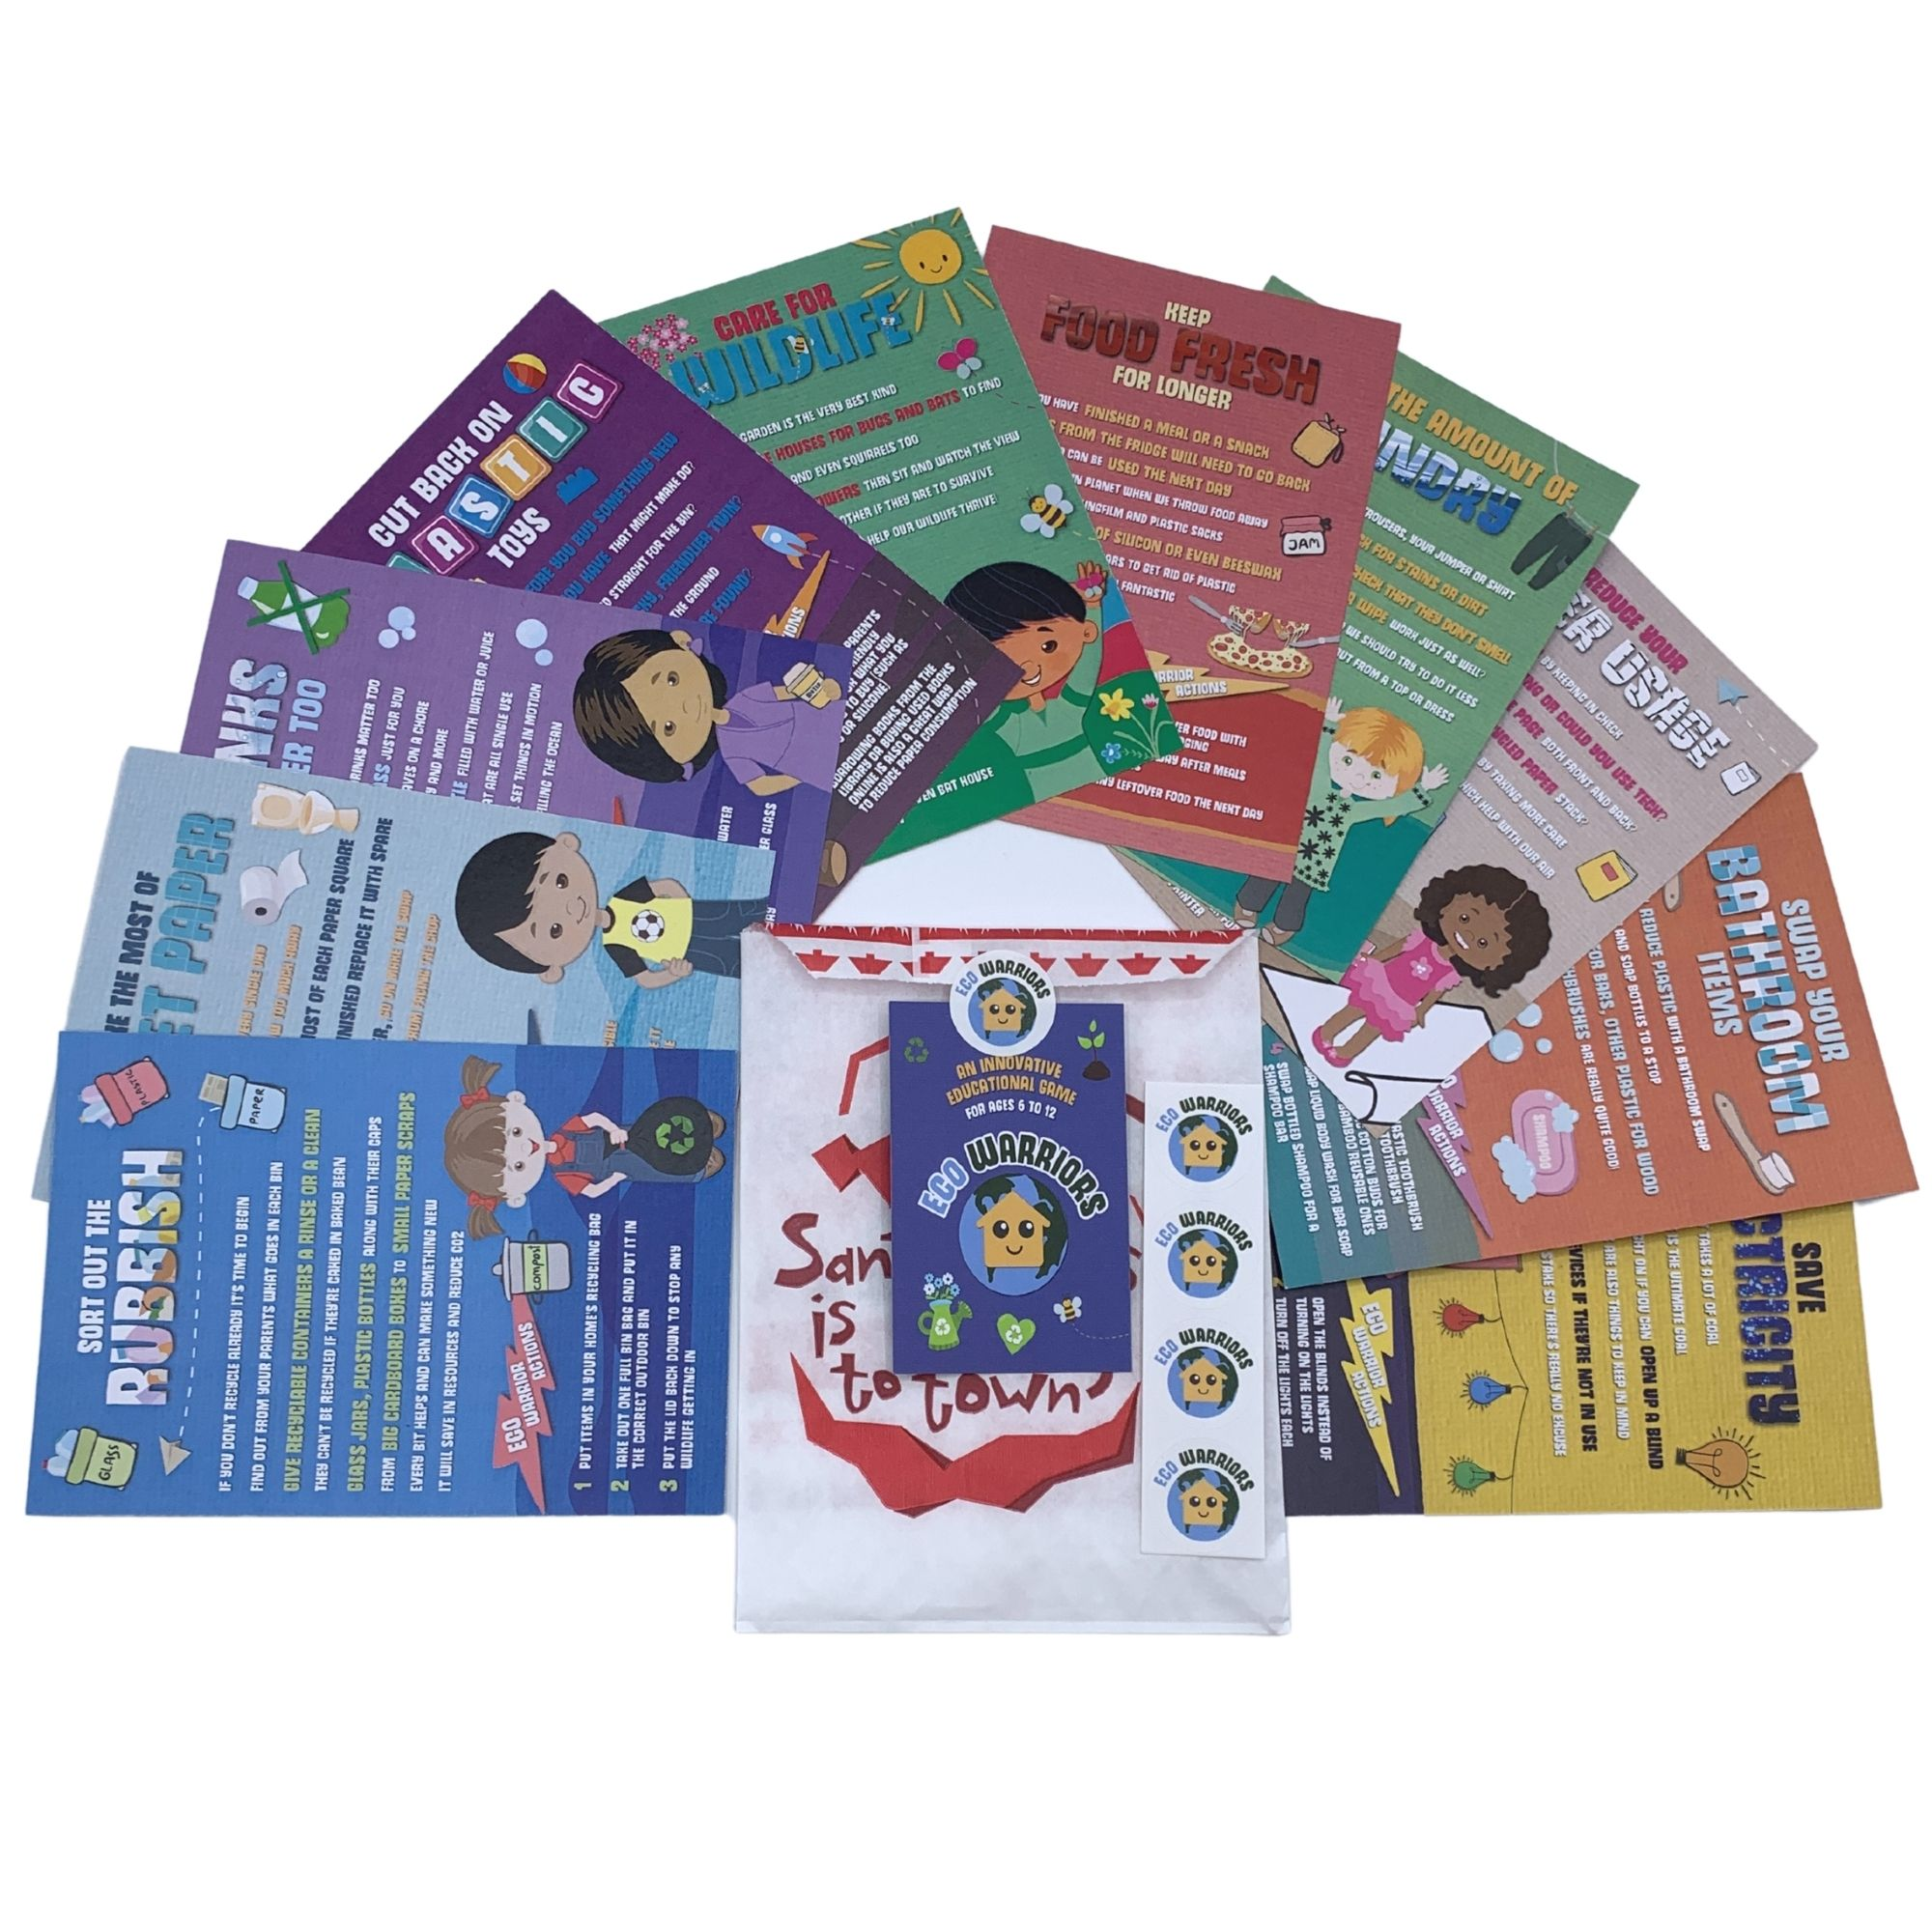 Eco warrior childrens activity book game